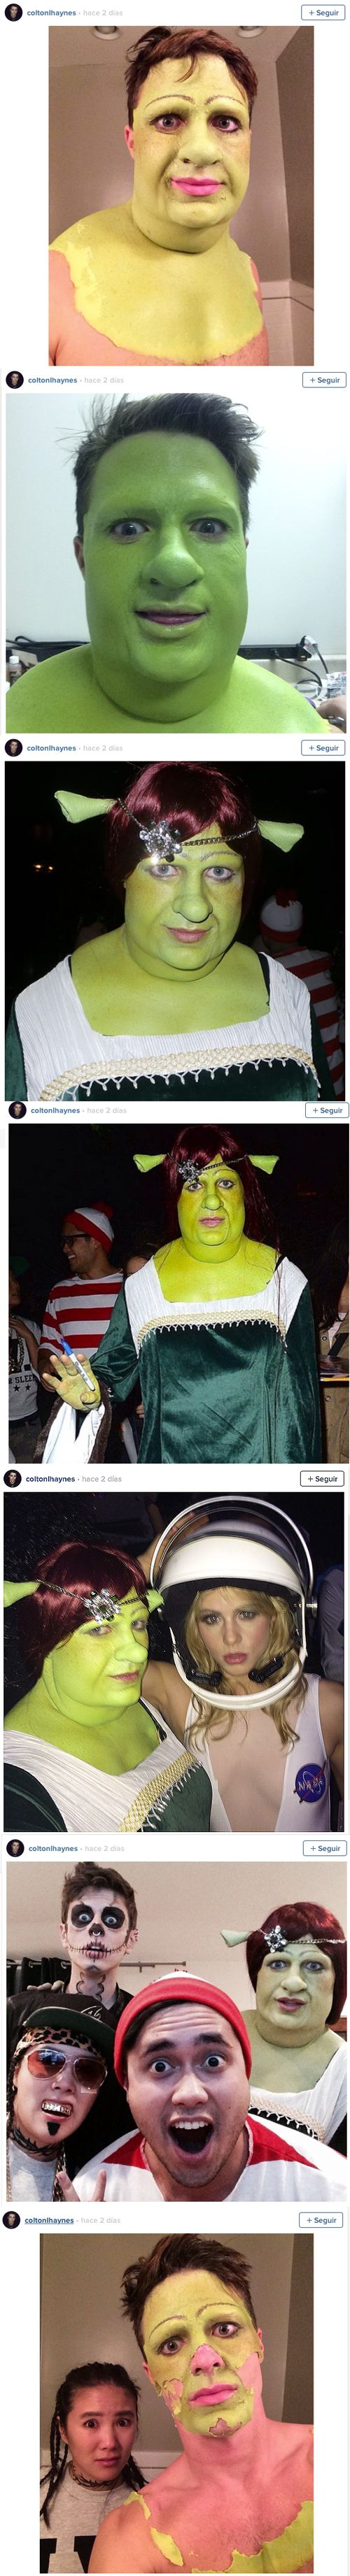 La princesa Fiona es... ¡un famoso chulazo!   Shangay